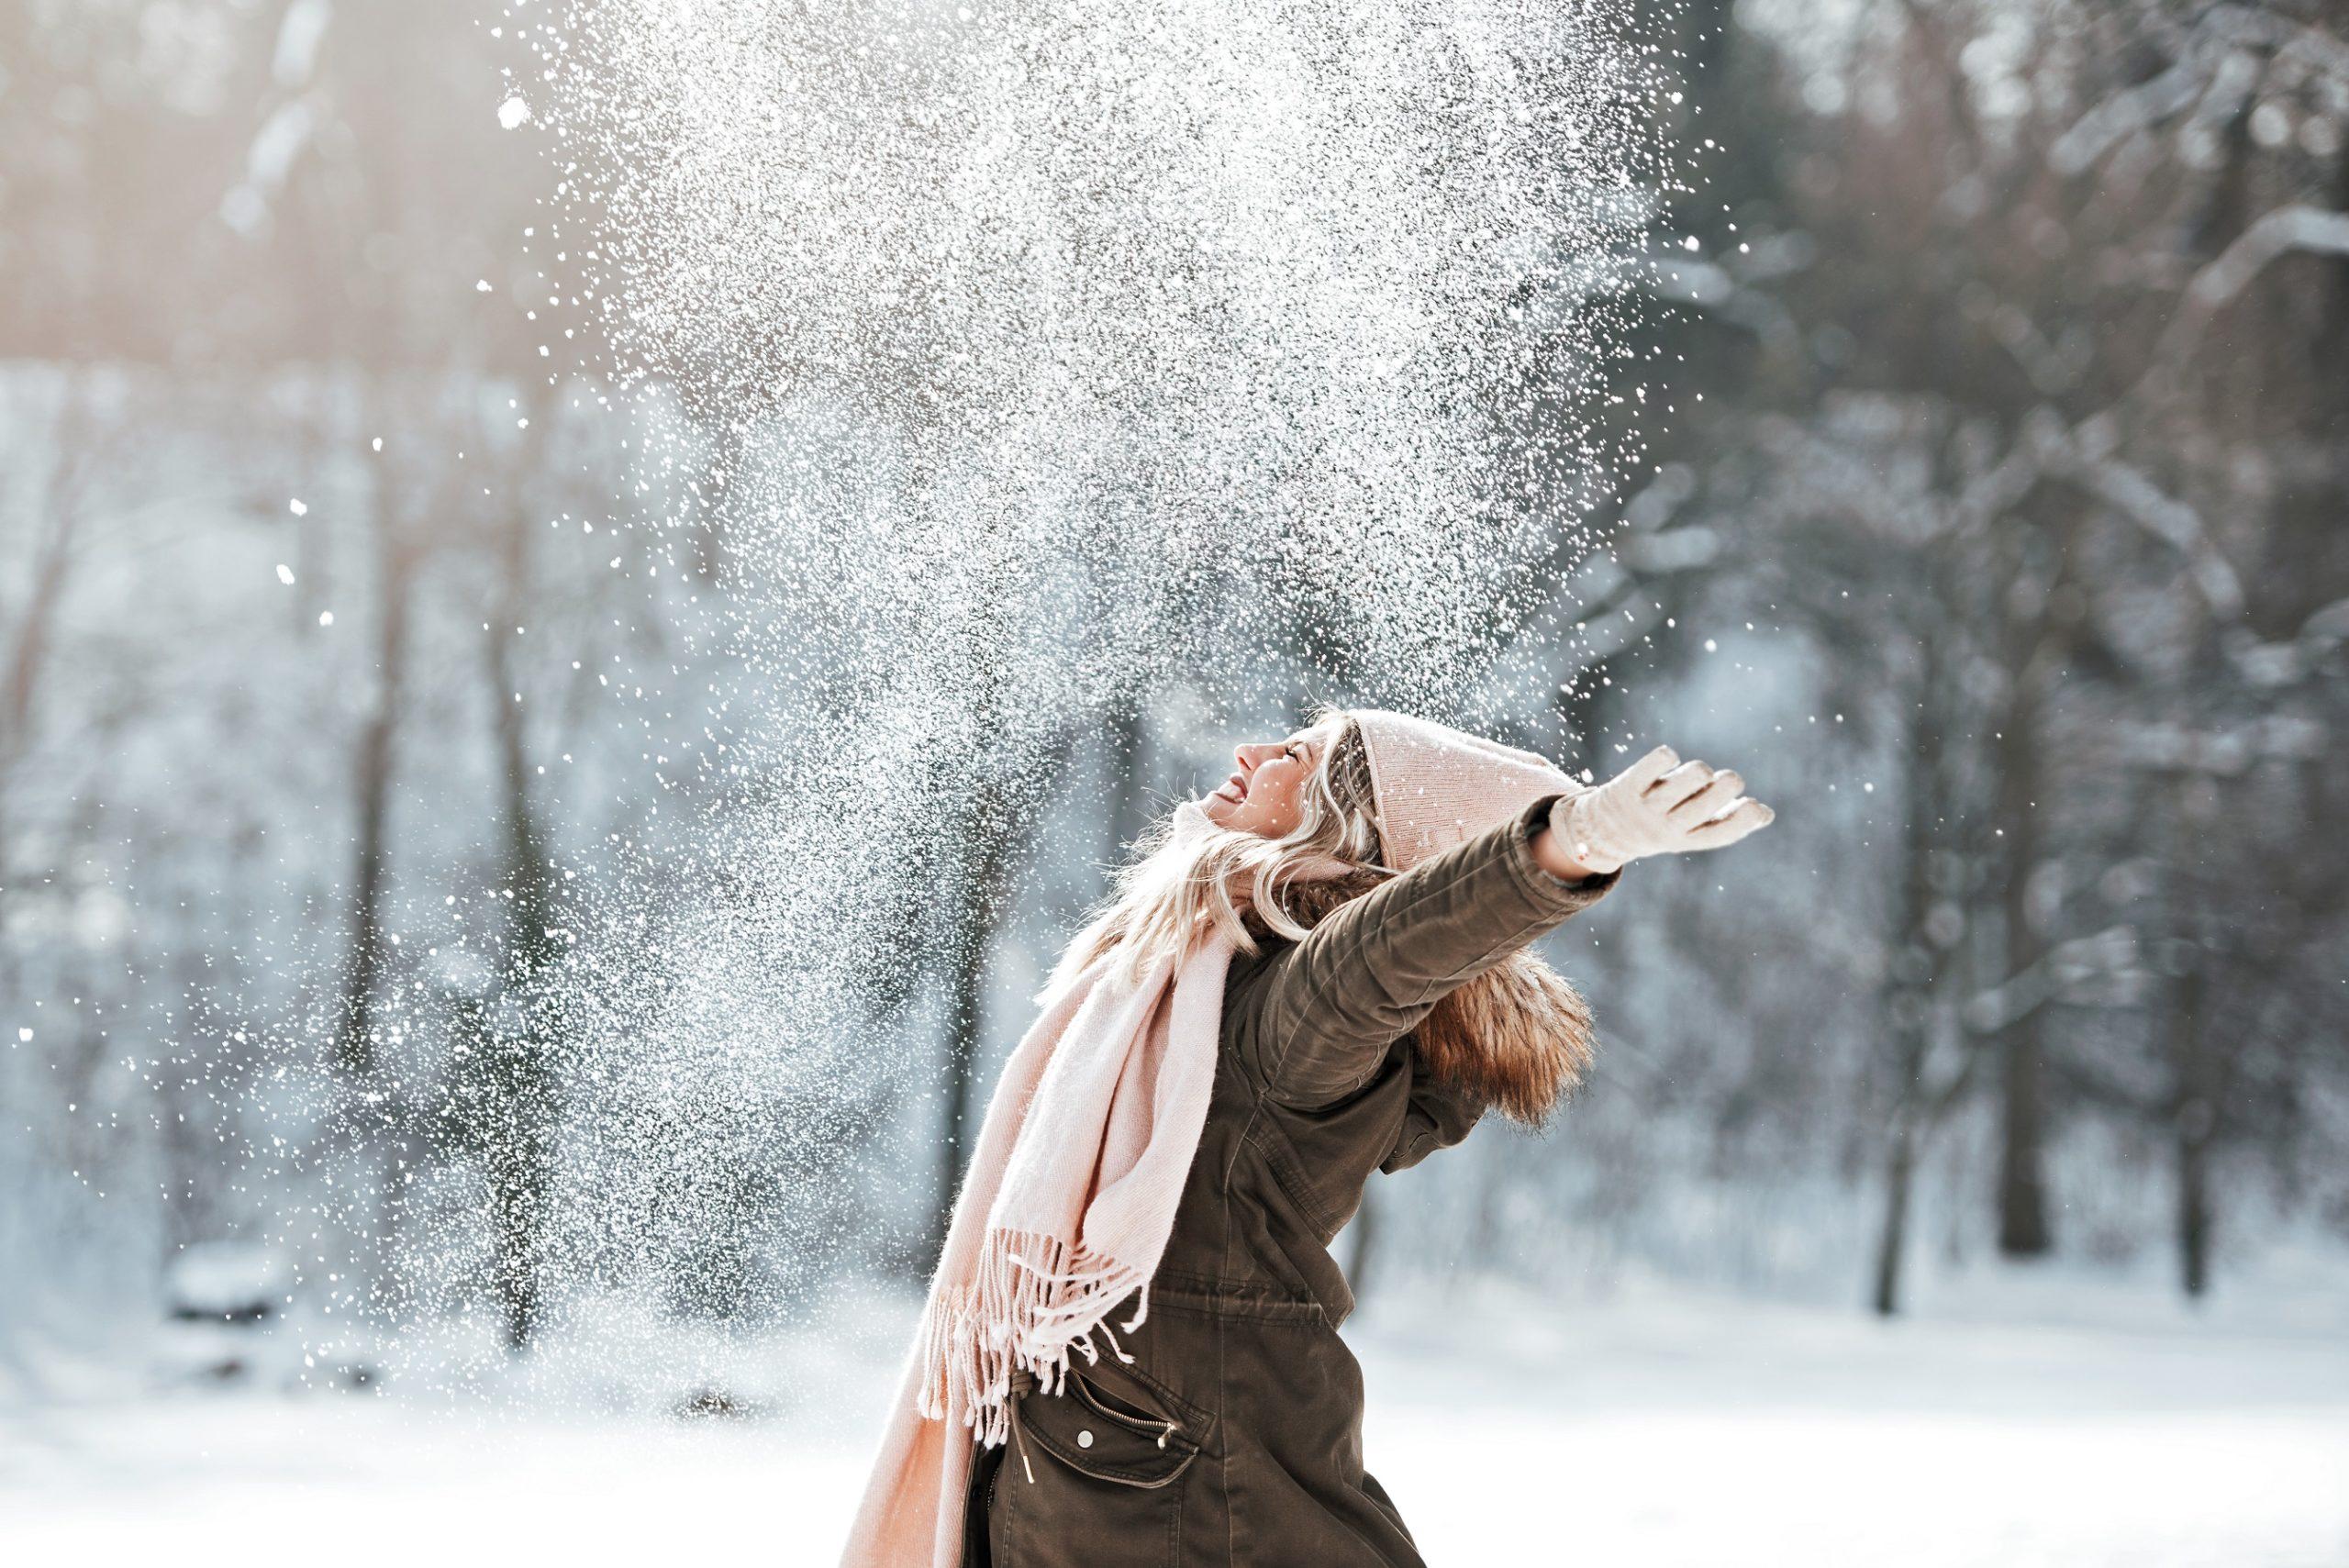 immunell winter immunity